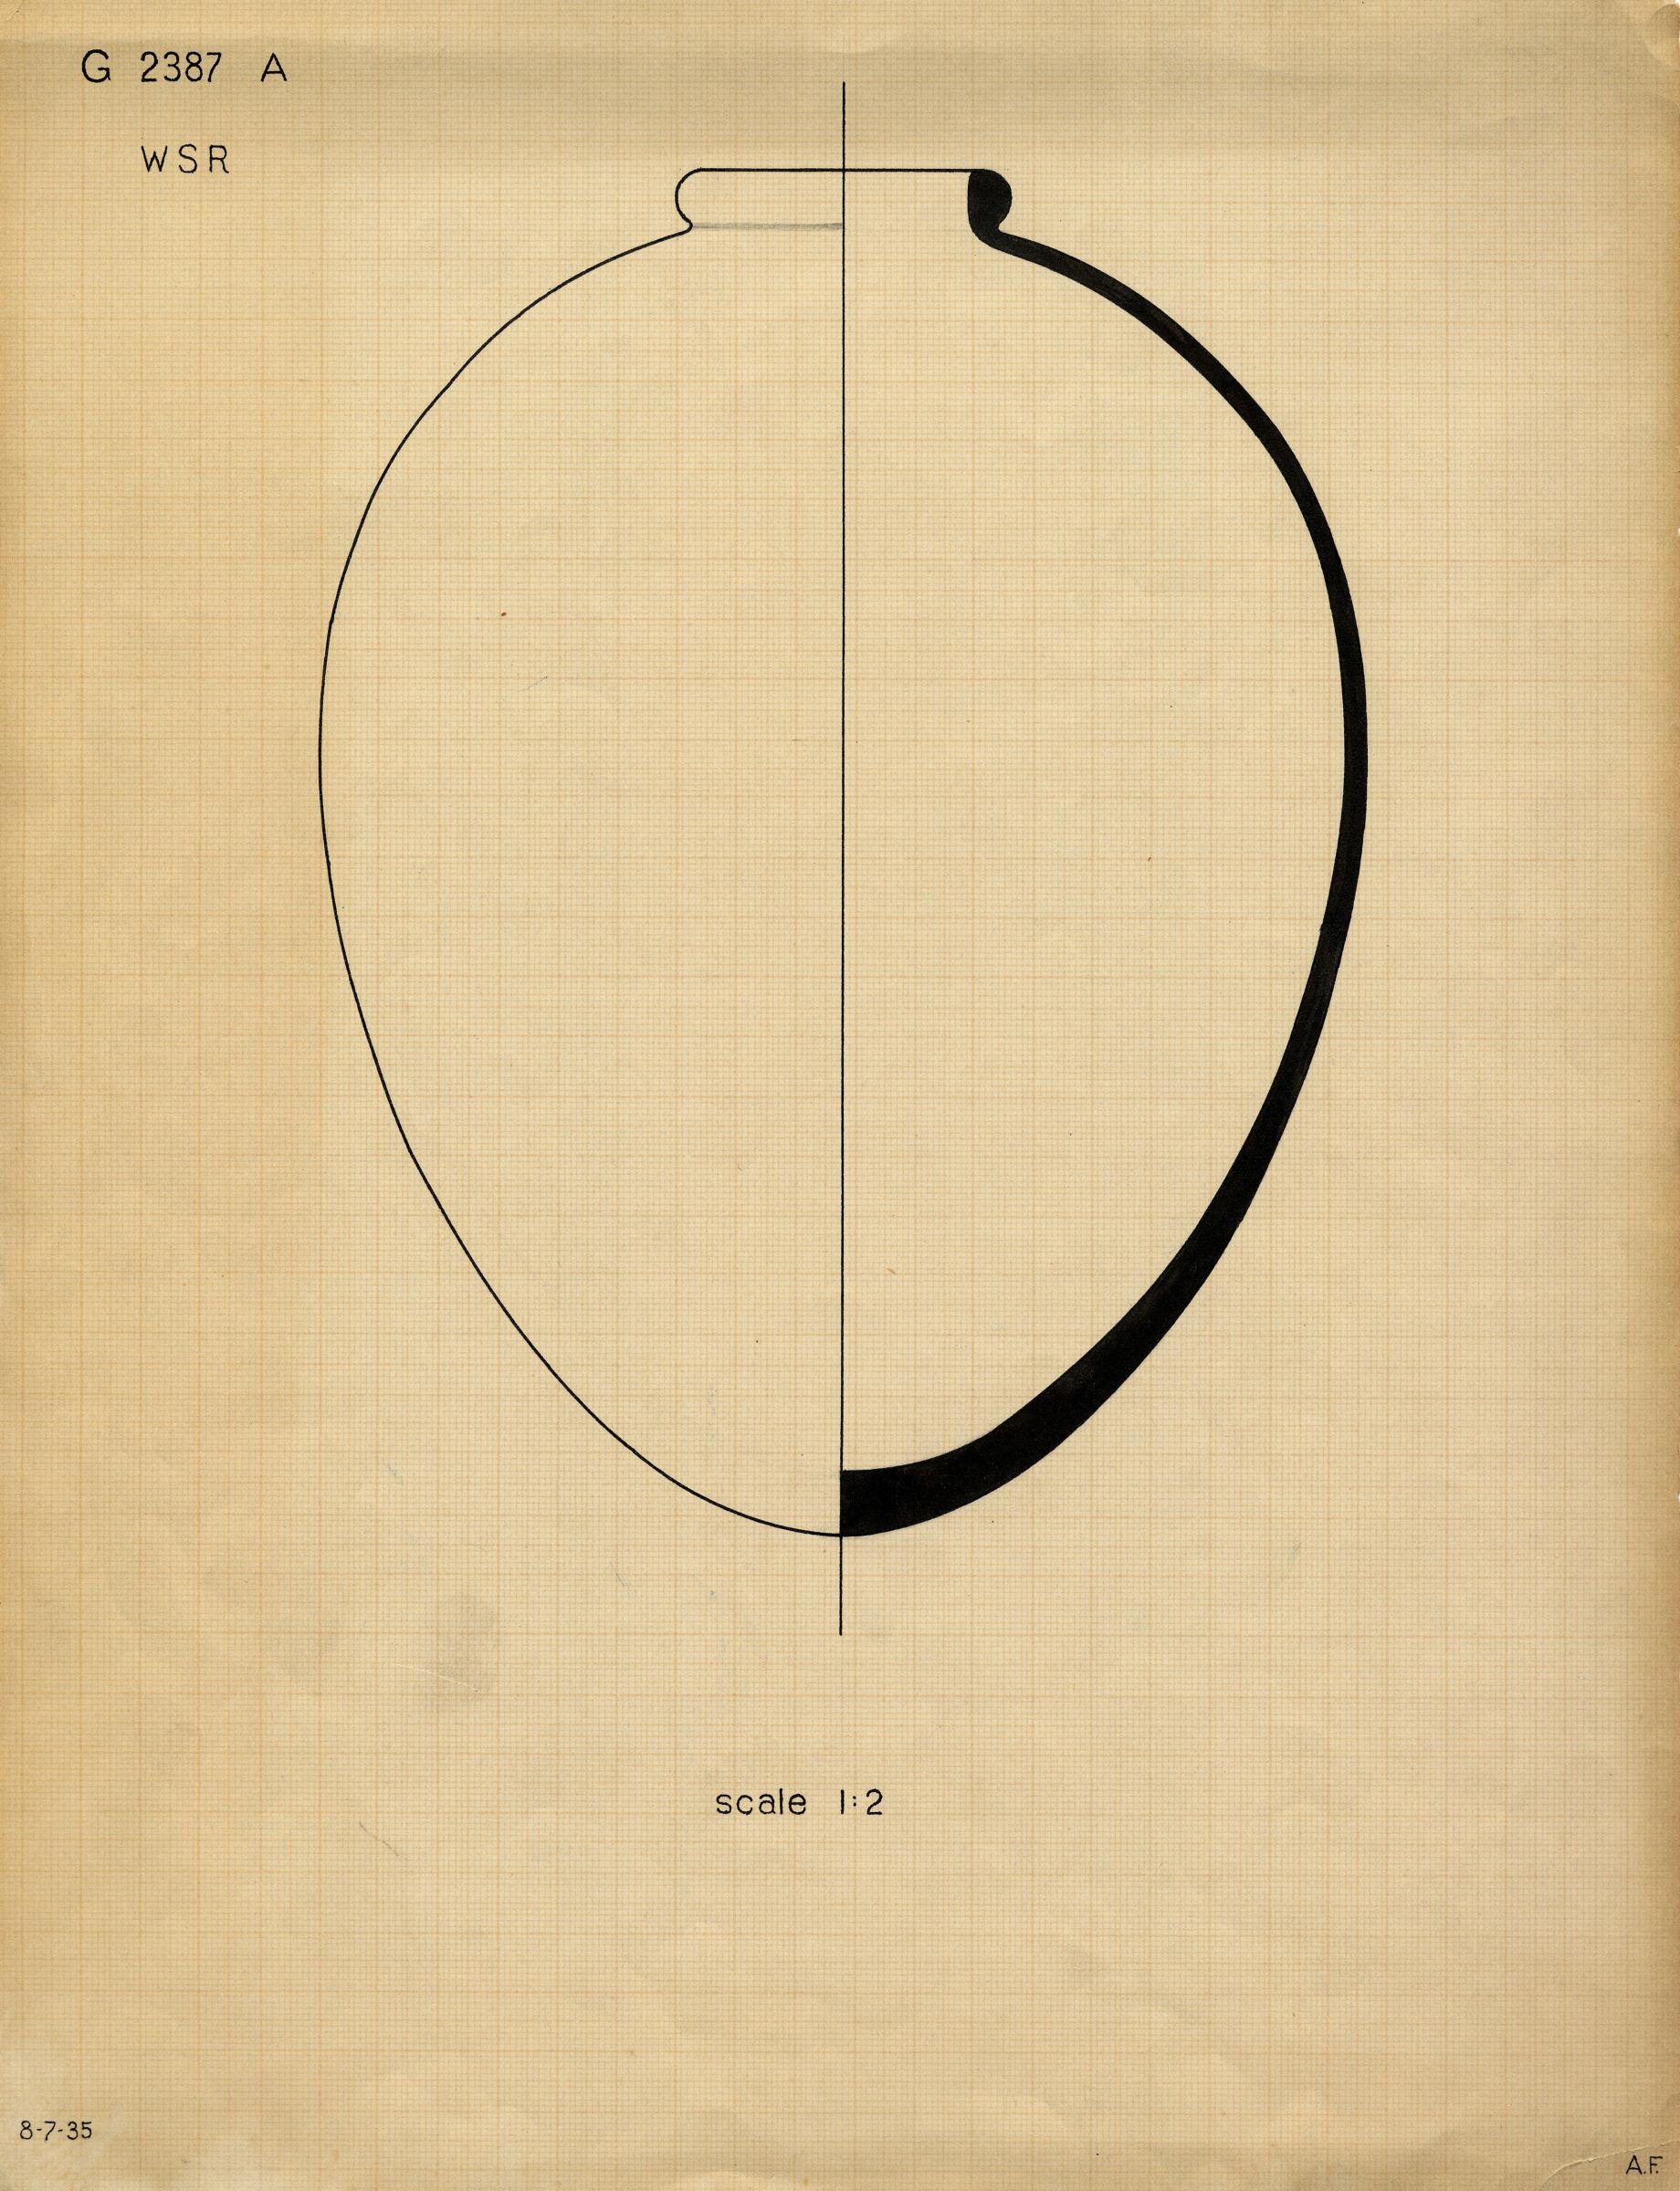 Drawings: G 2387, Shaft A: pottery, jar